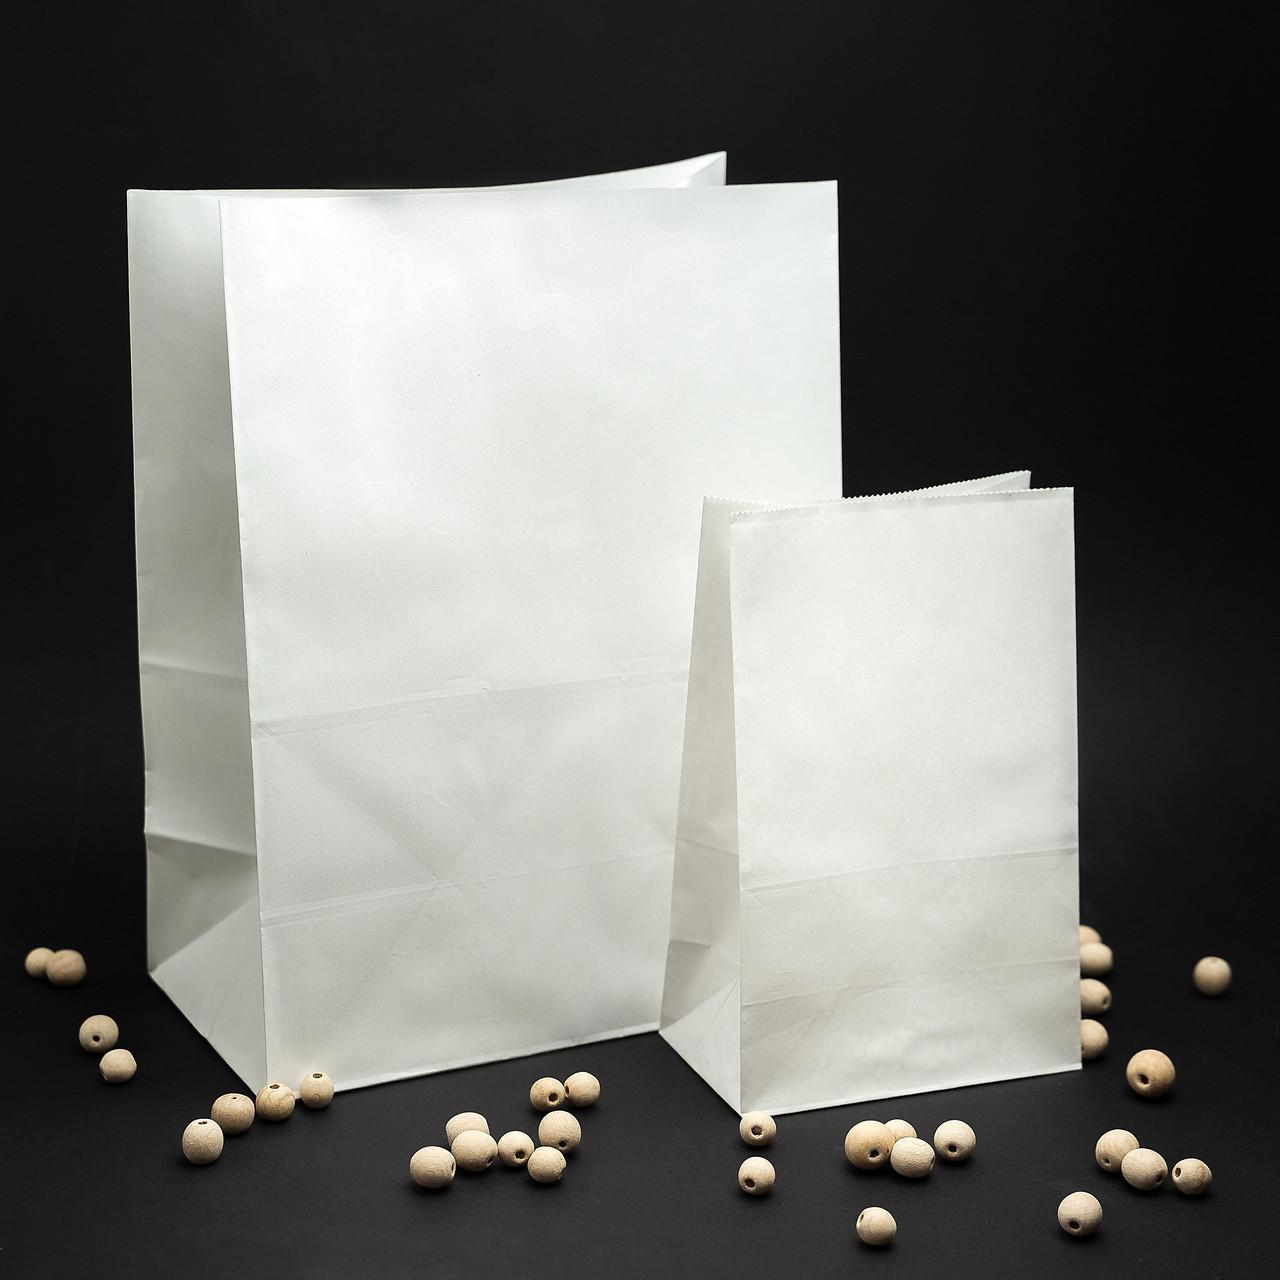 Готові паперові пакети білі 320*150*380 мм Крафт пакети з плоским дном, упаковка 500 штук